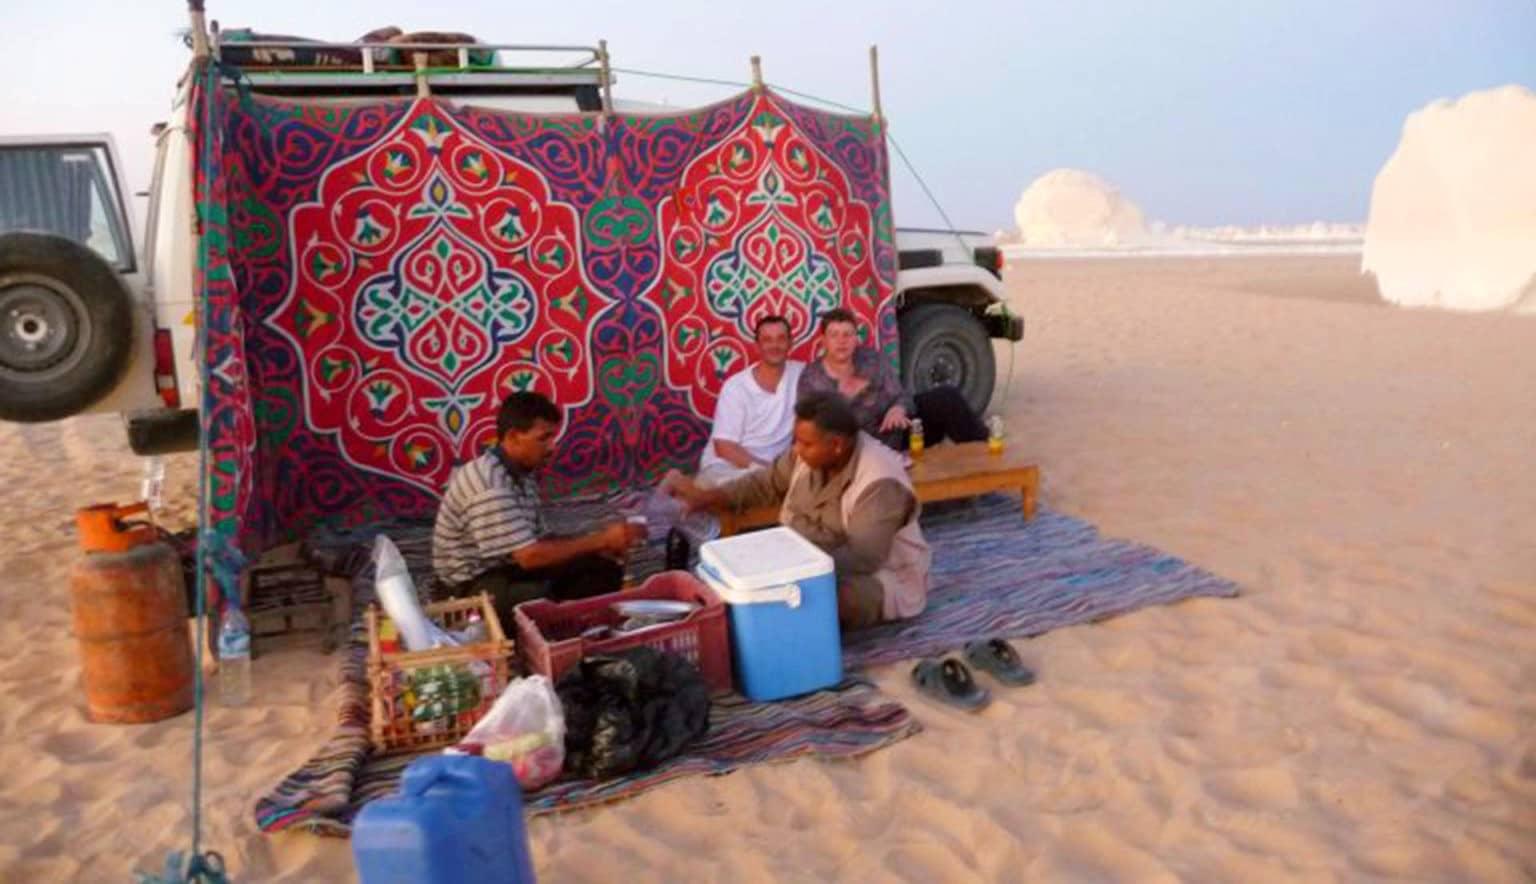 Vacances en Egypte sur mesure I Laurent Guerreiro Juillet 2008